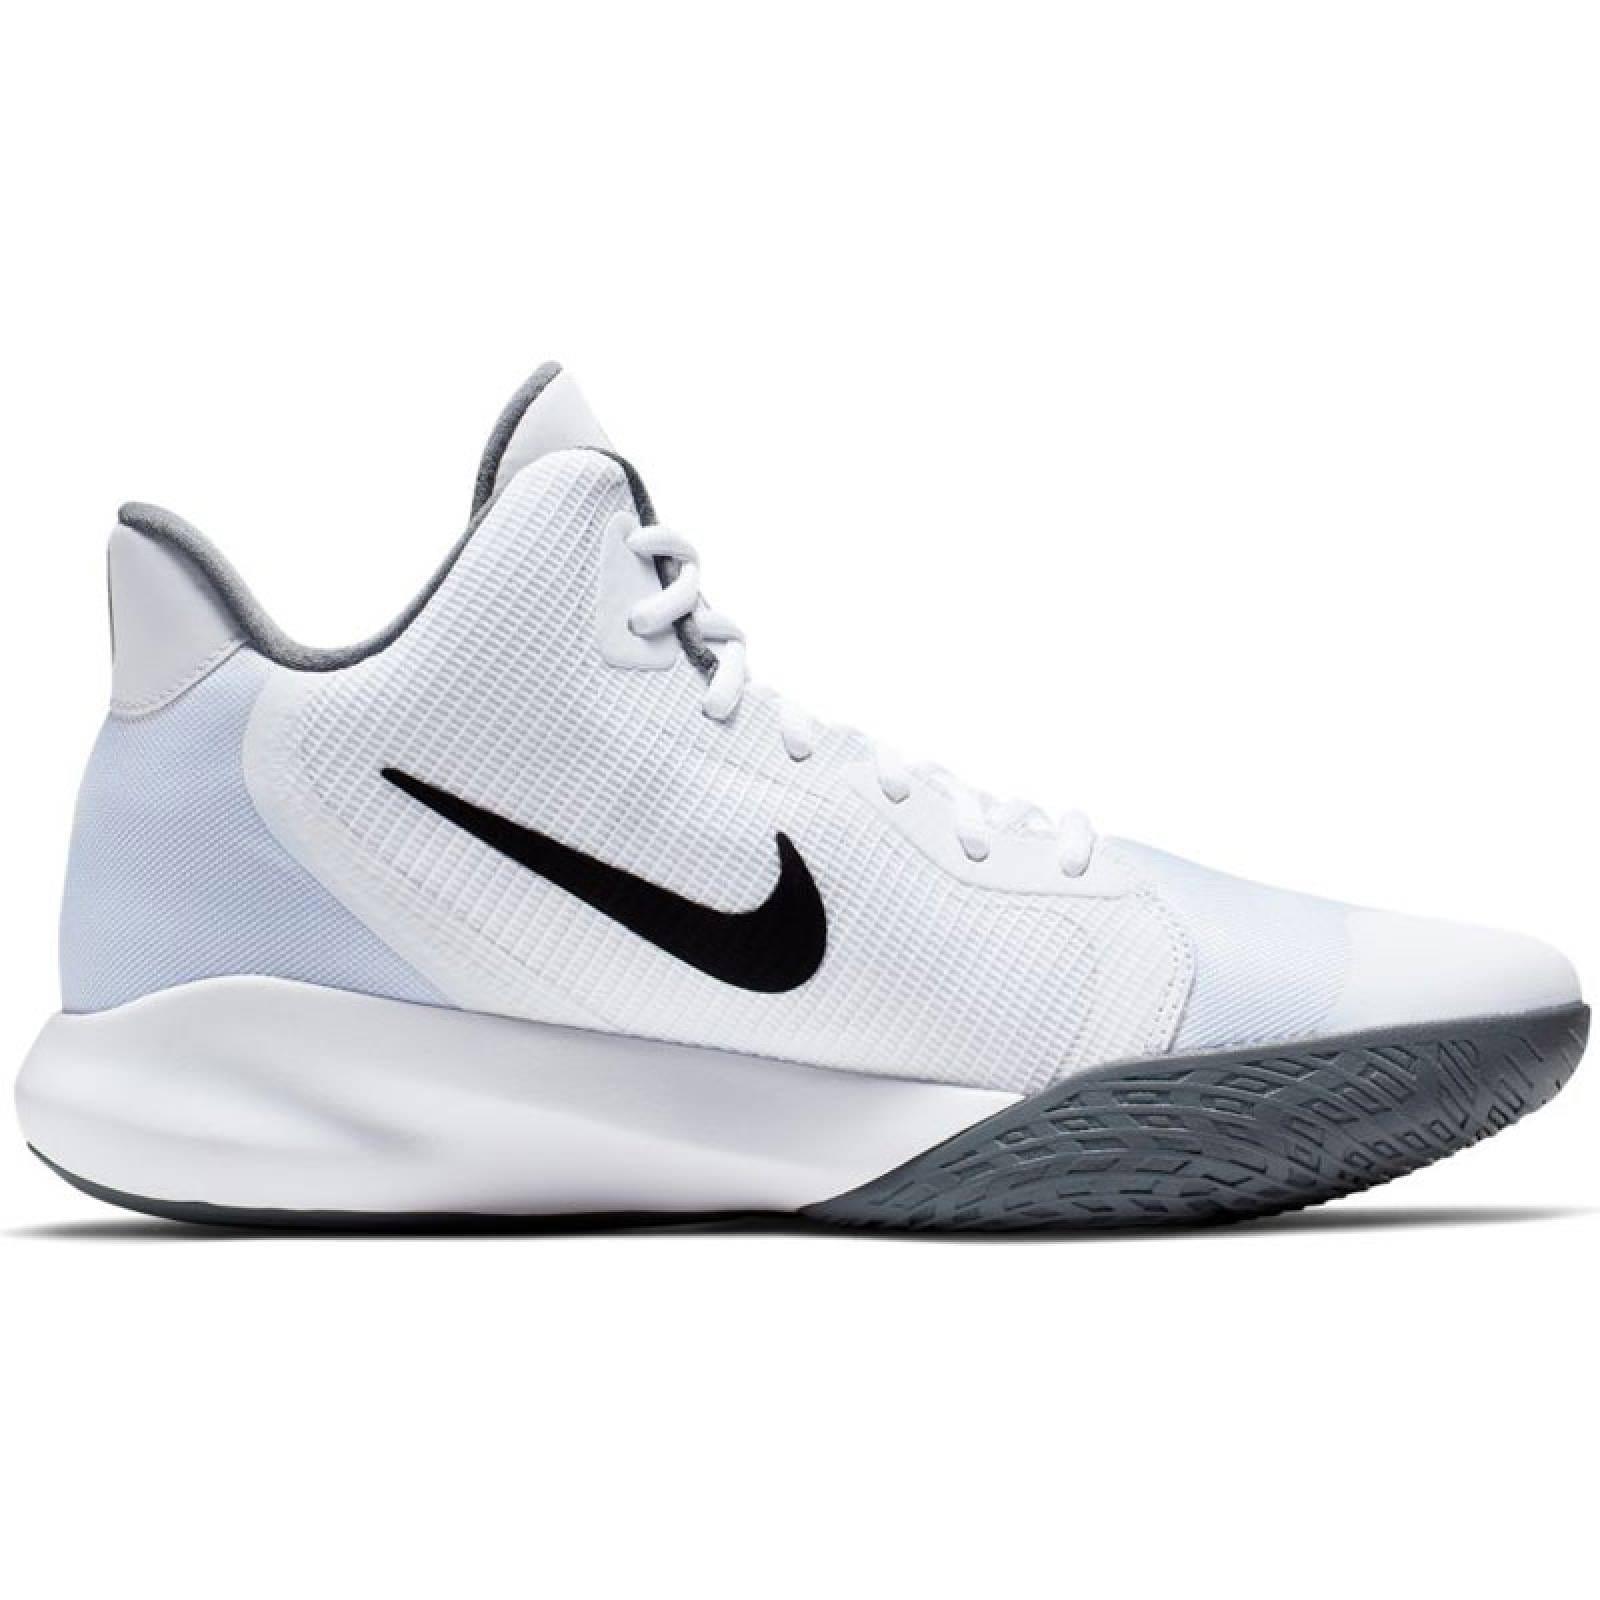 Tenis Nike Precision III